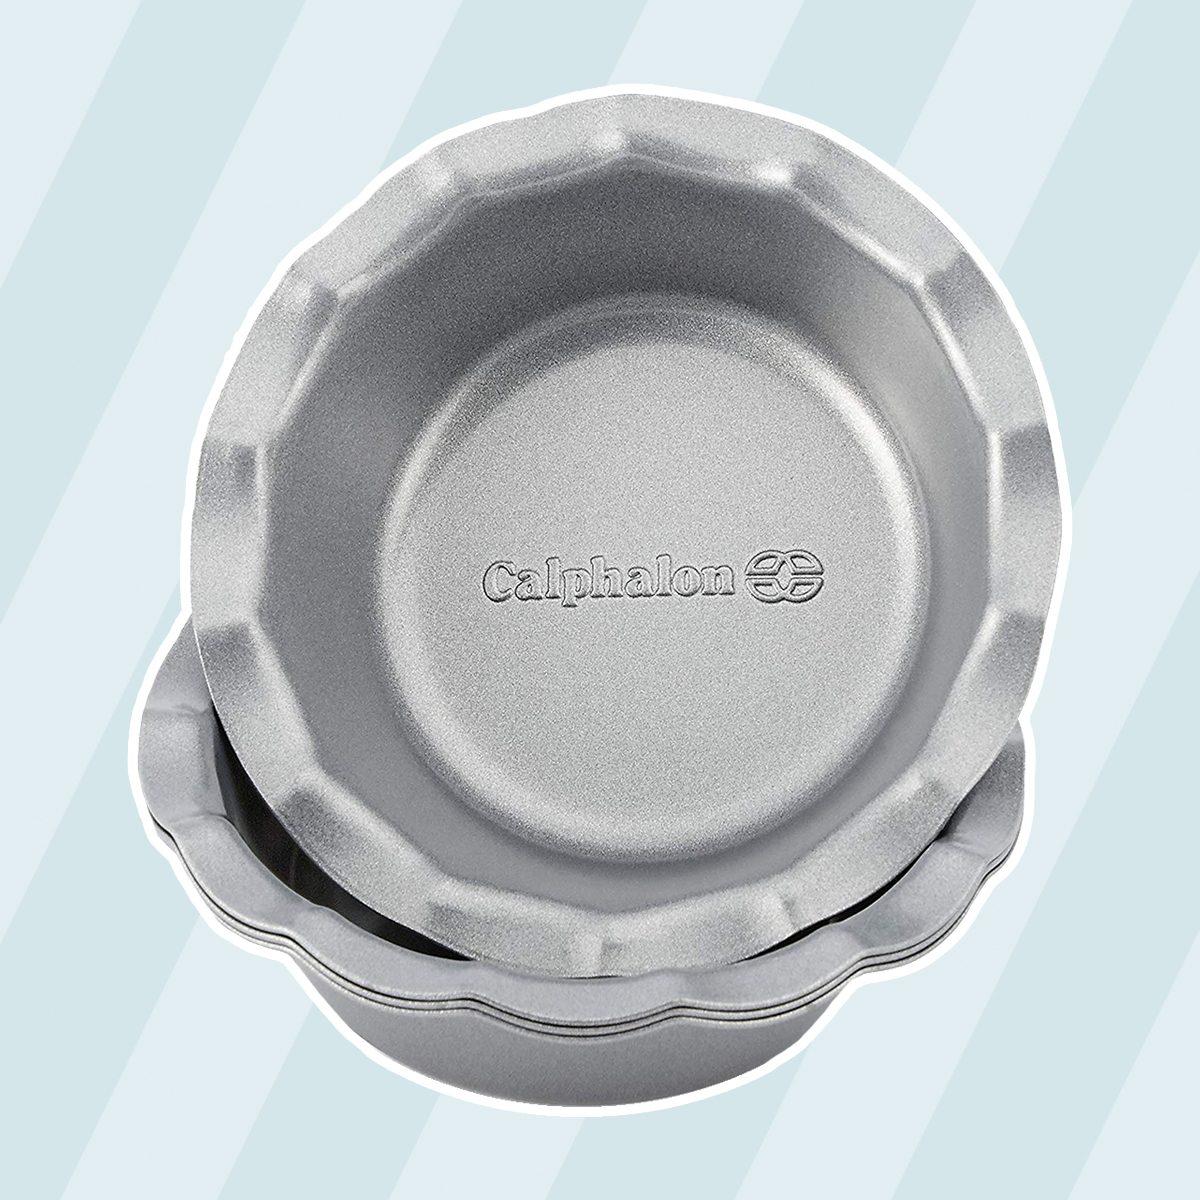 Calphalon Nonstick Mini Pie Pans